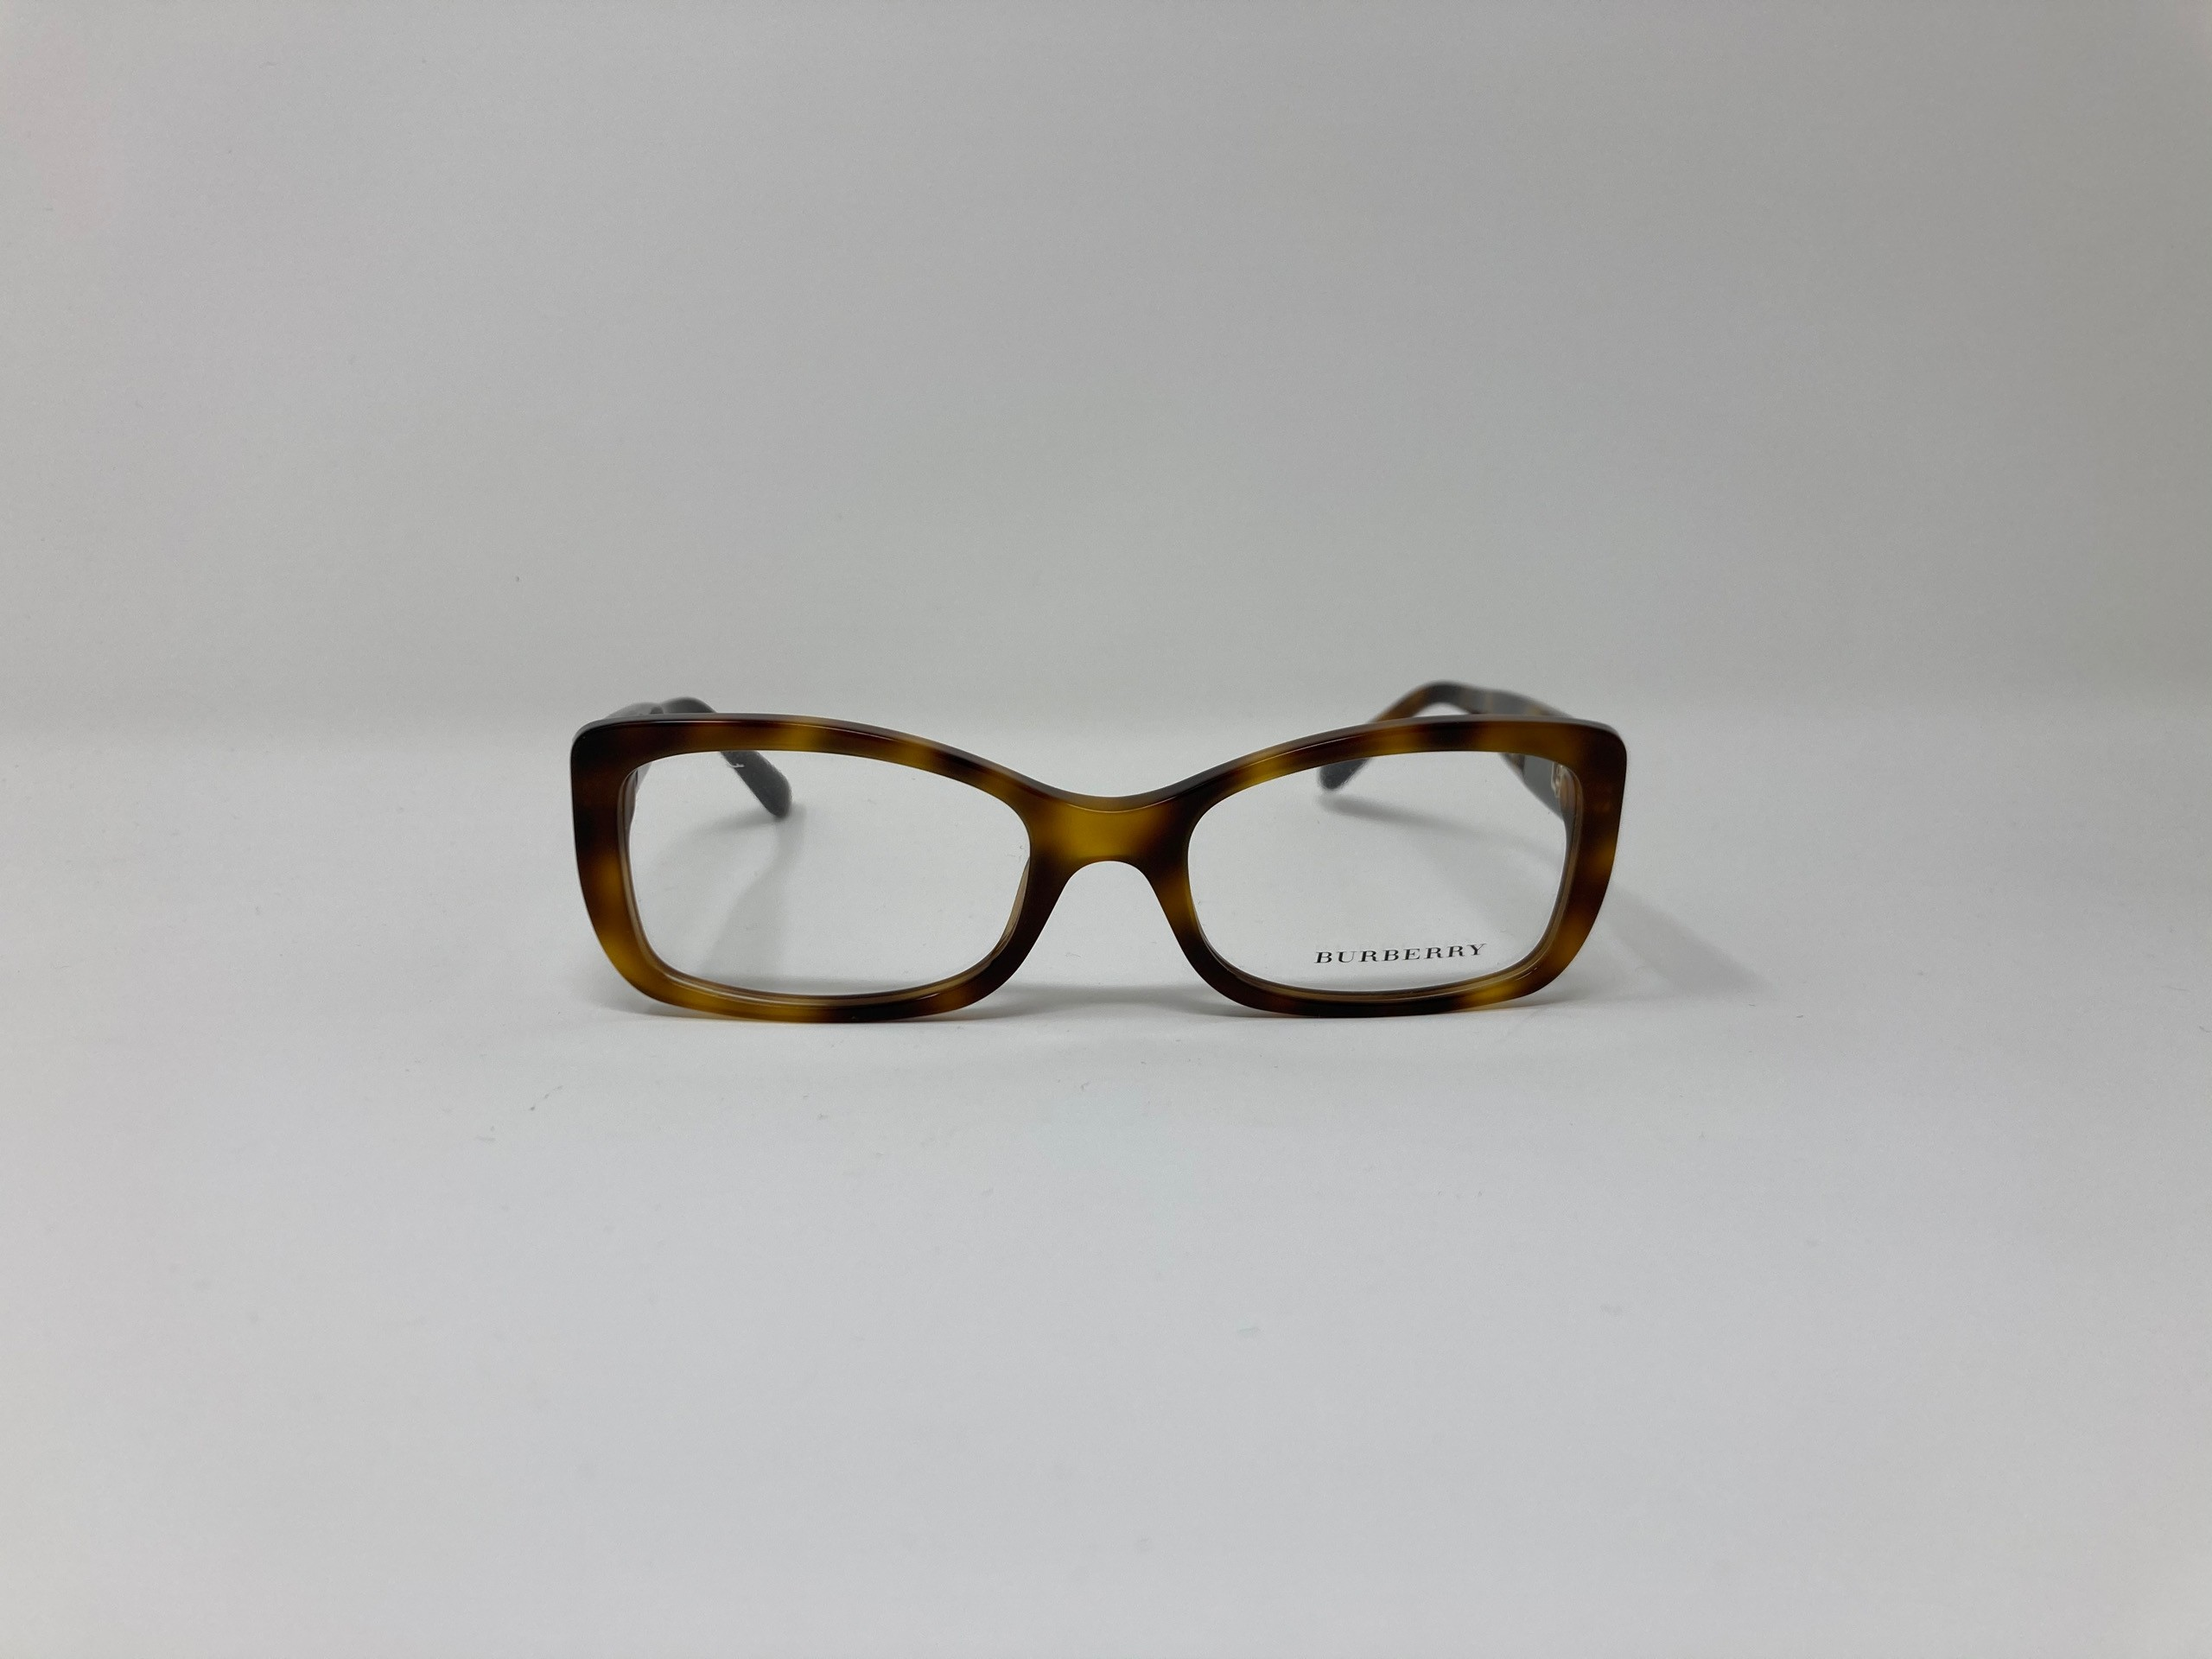 Burberry B 2130 Unisex eyeglasses